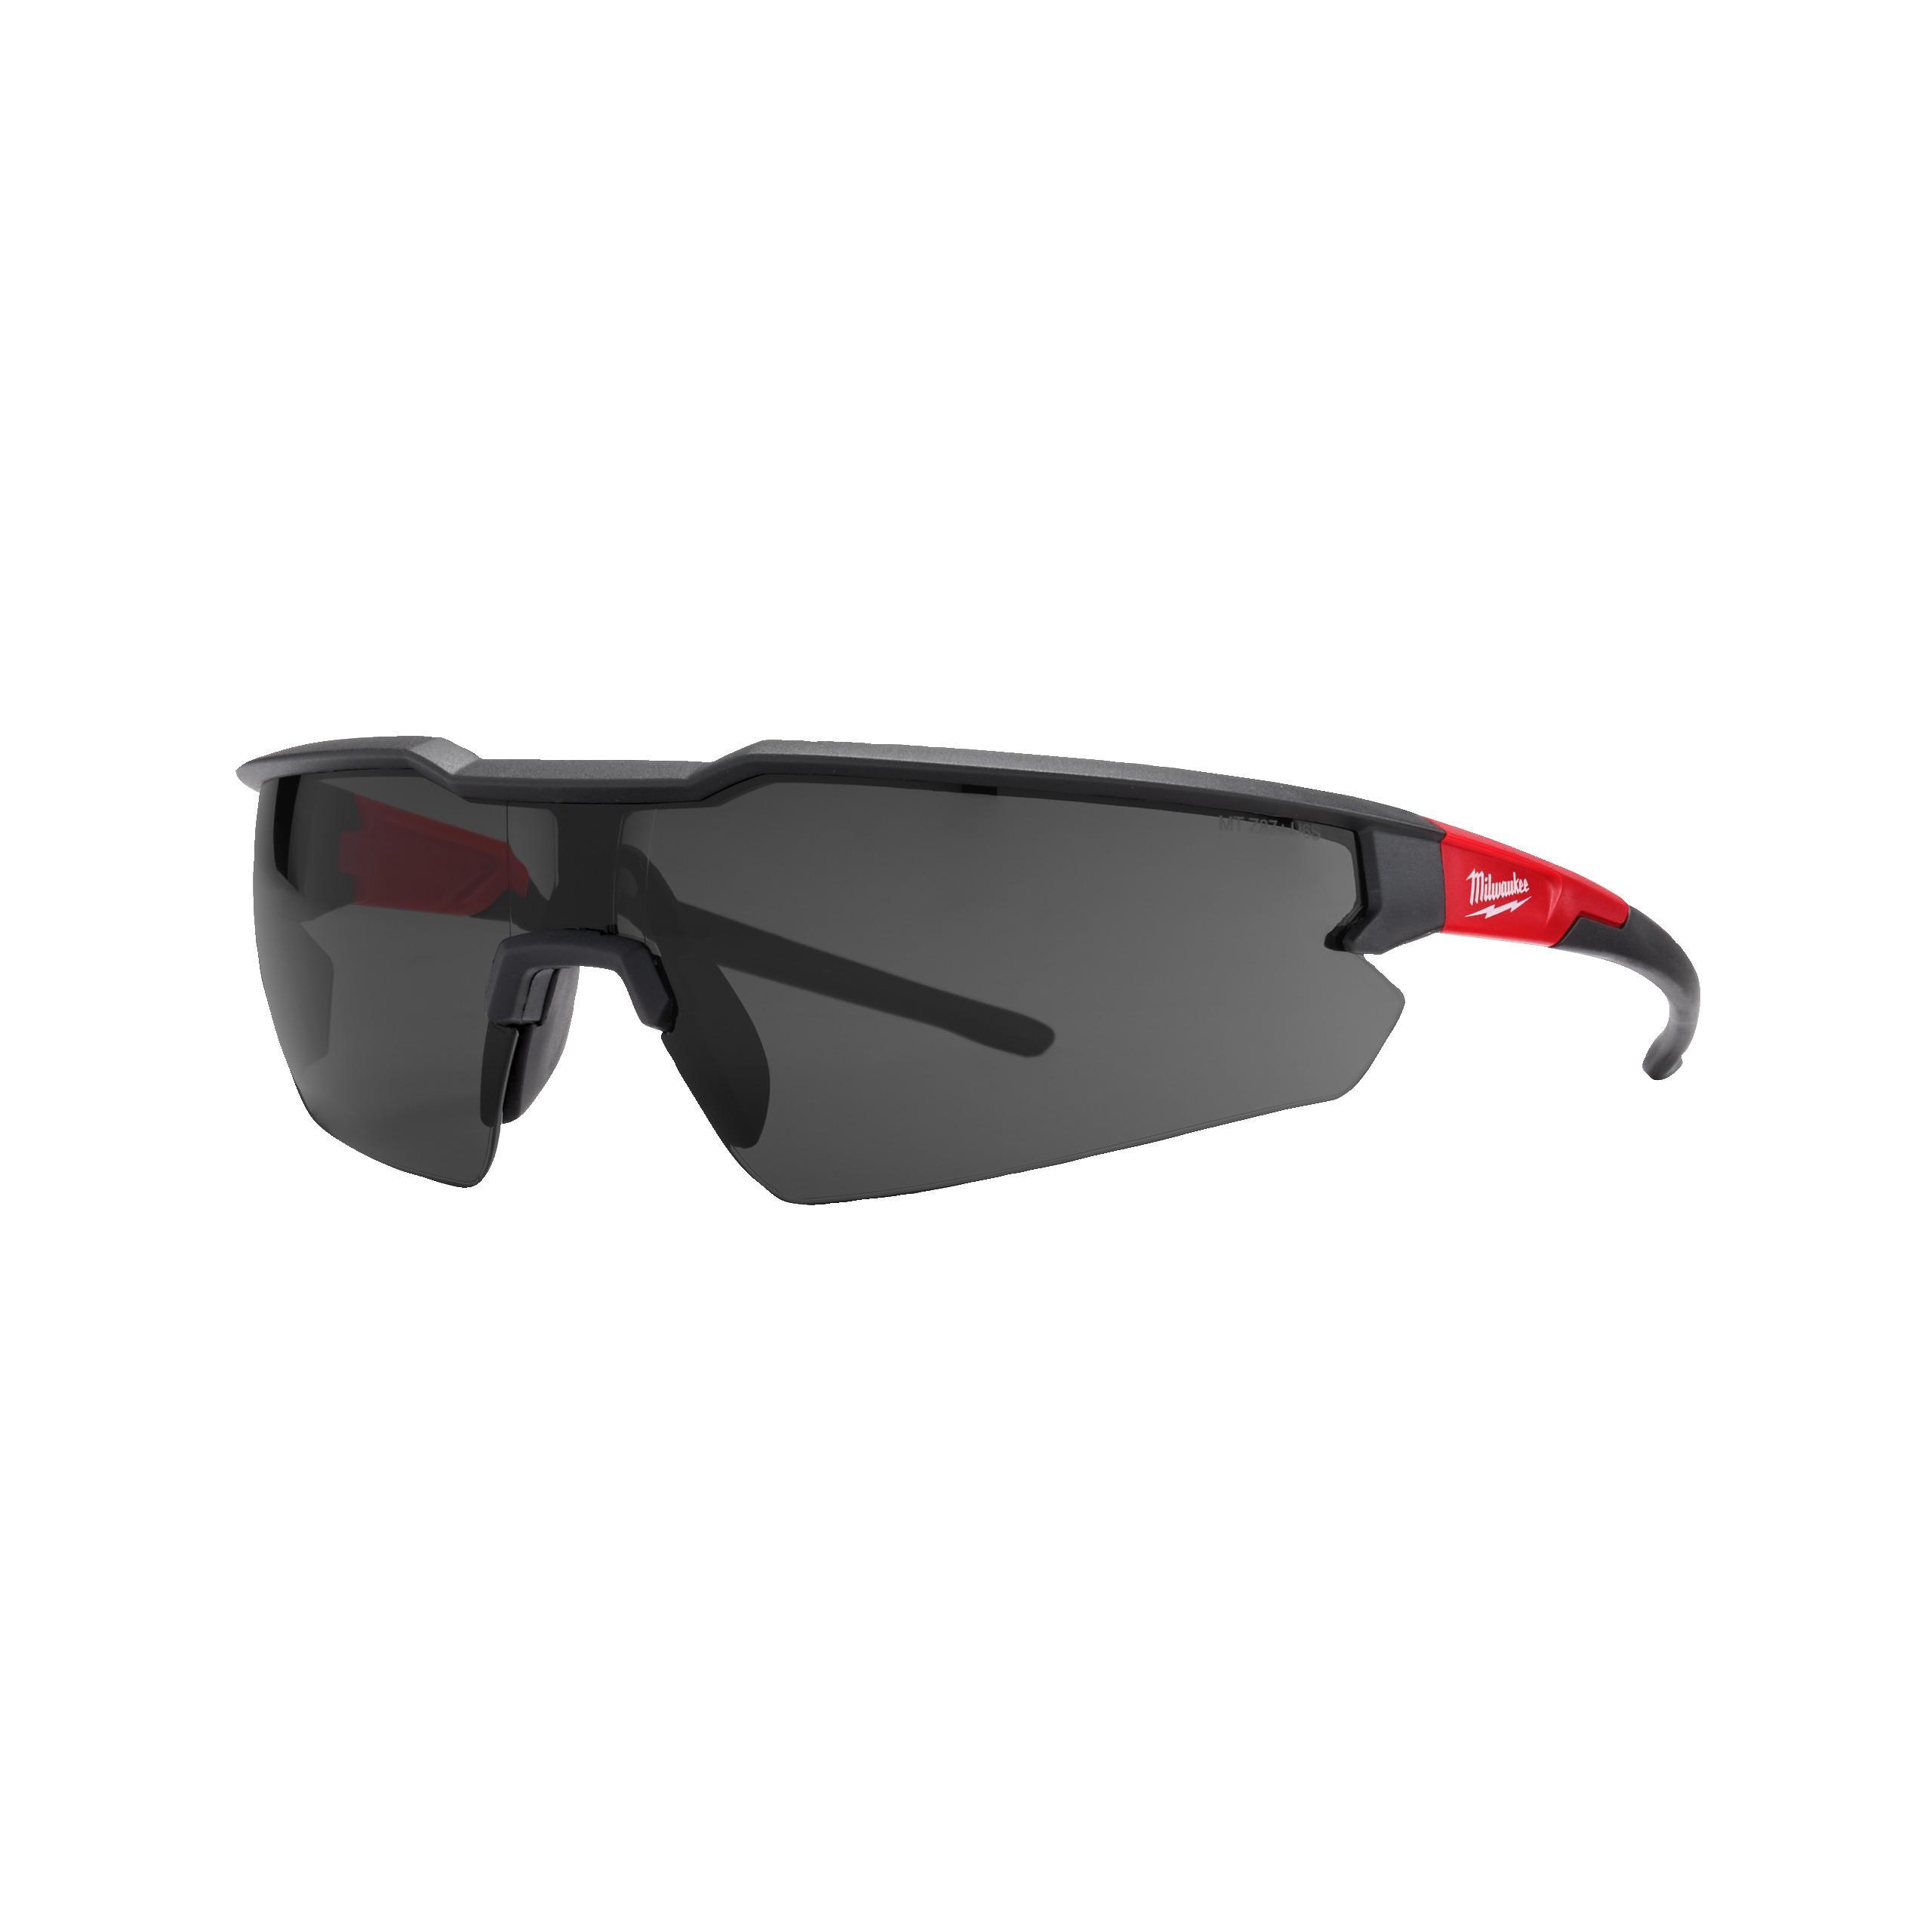 Ochranné brýle zatmavené - 1ks